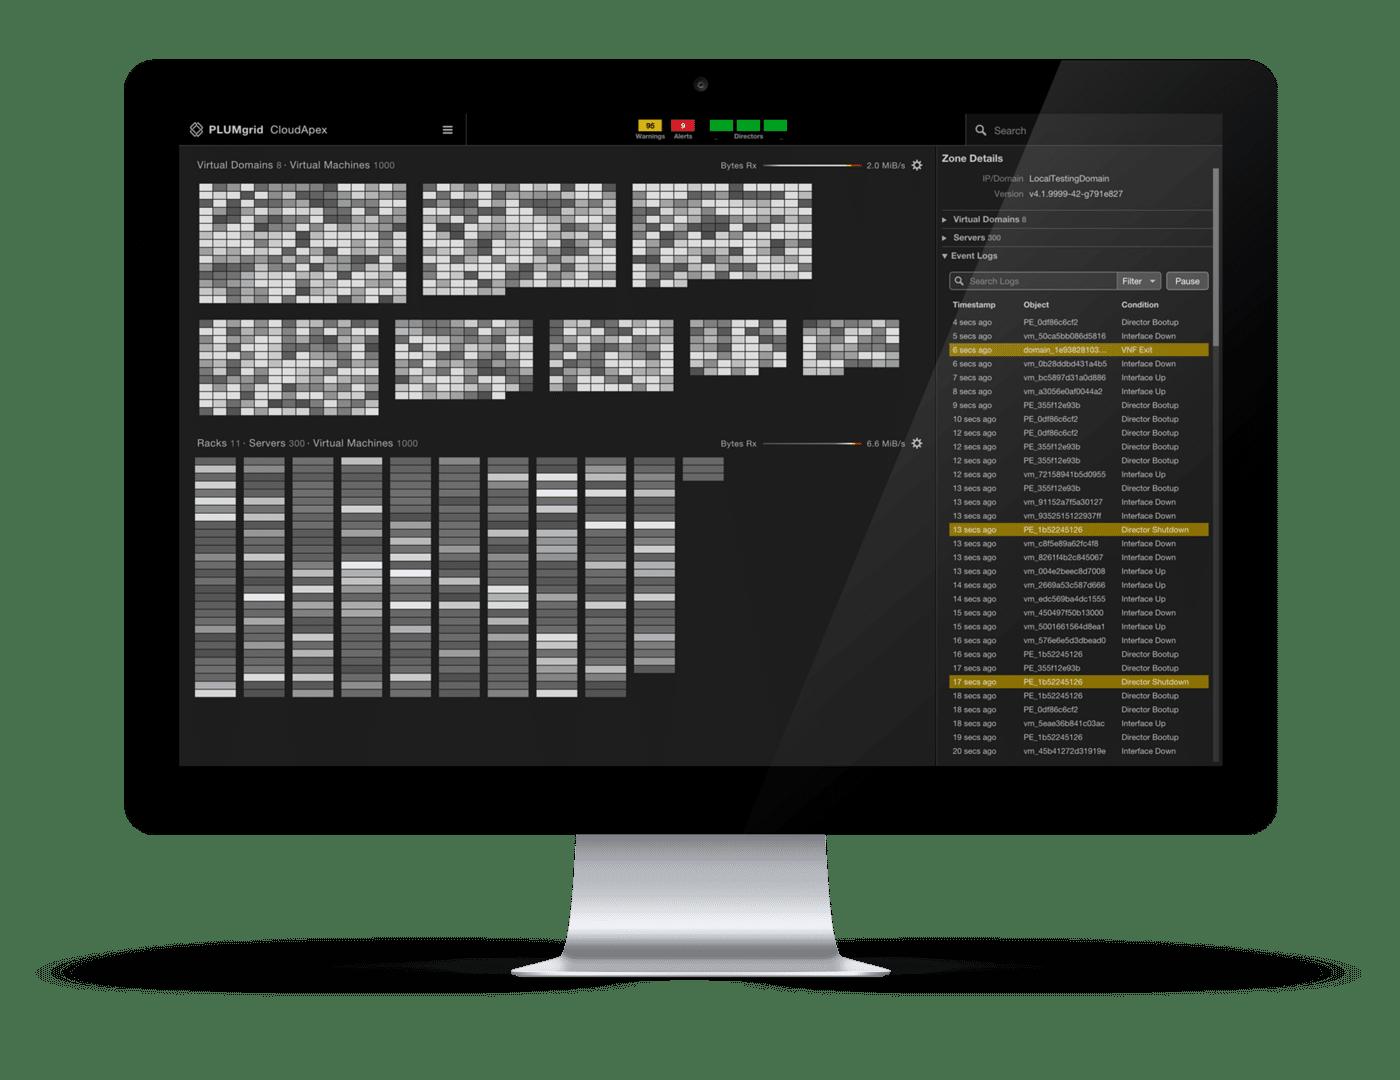 PLUMgrid CloudApex - Network Visualization and Monitoring